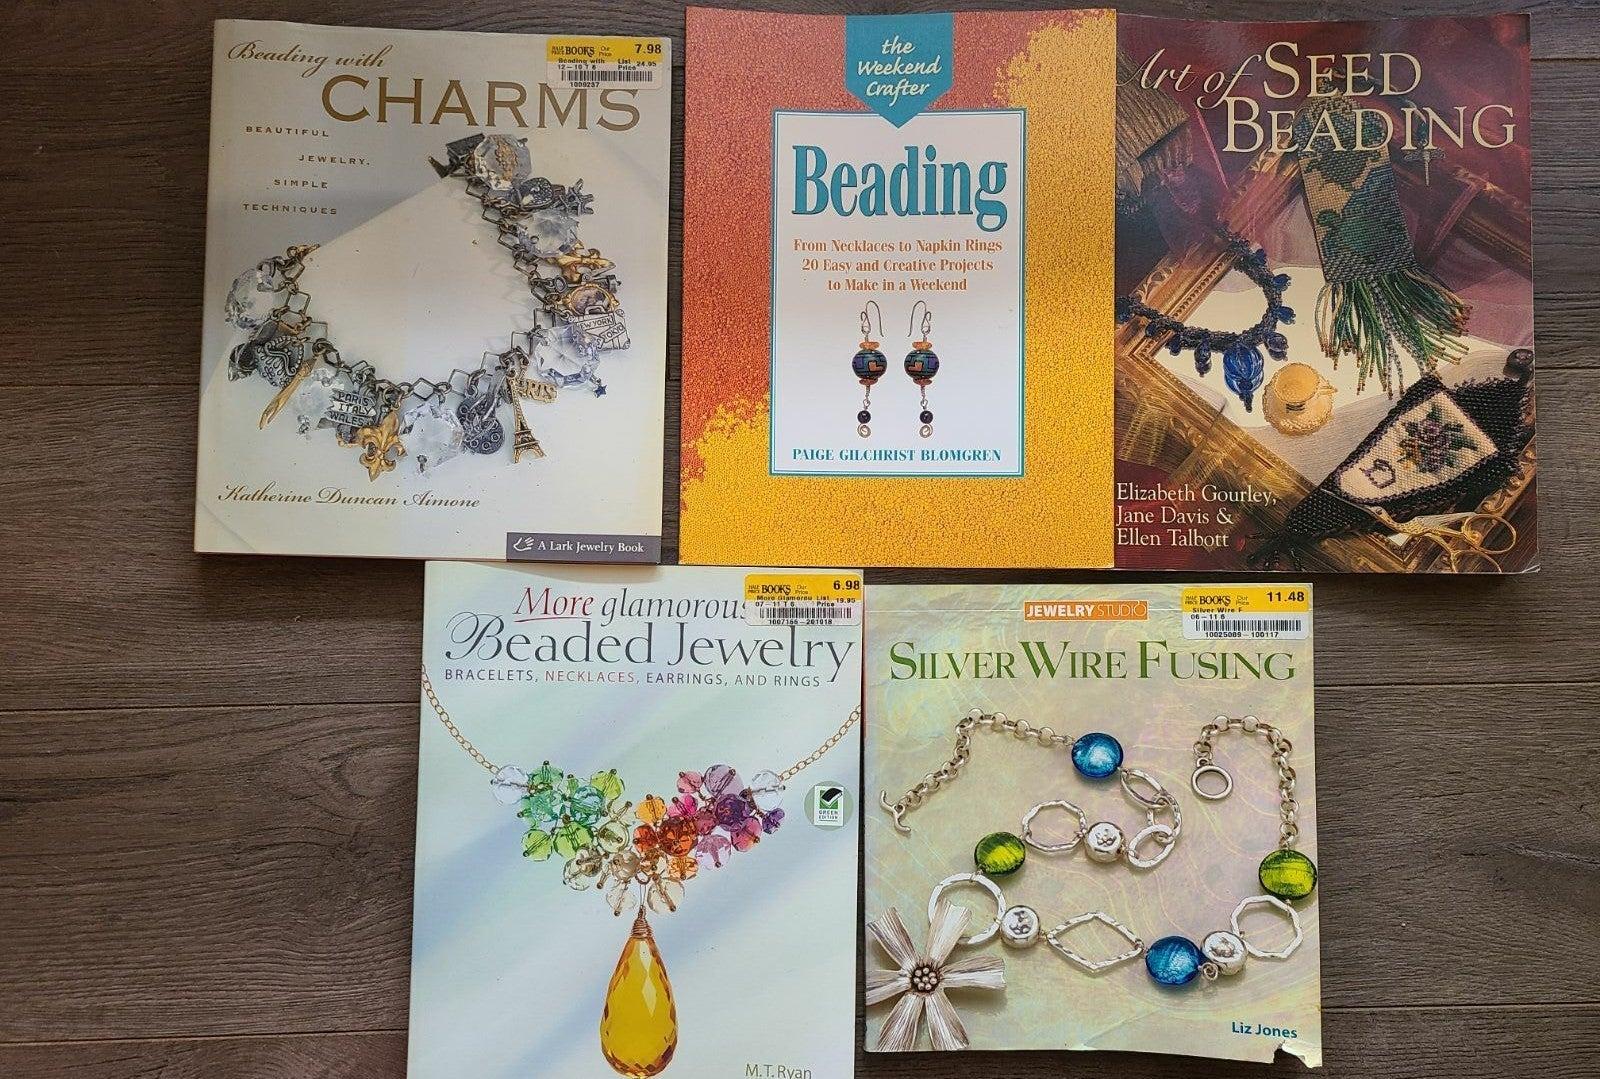 Set of jewelry making/beading books